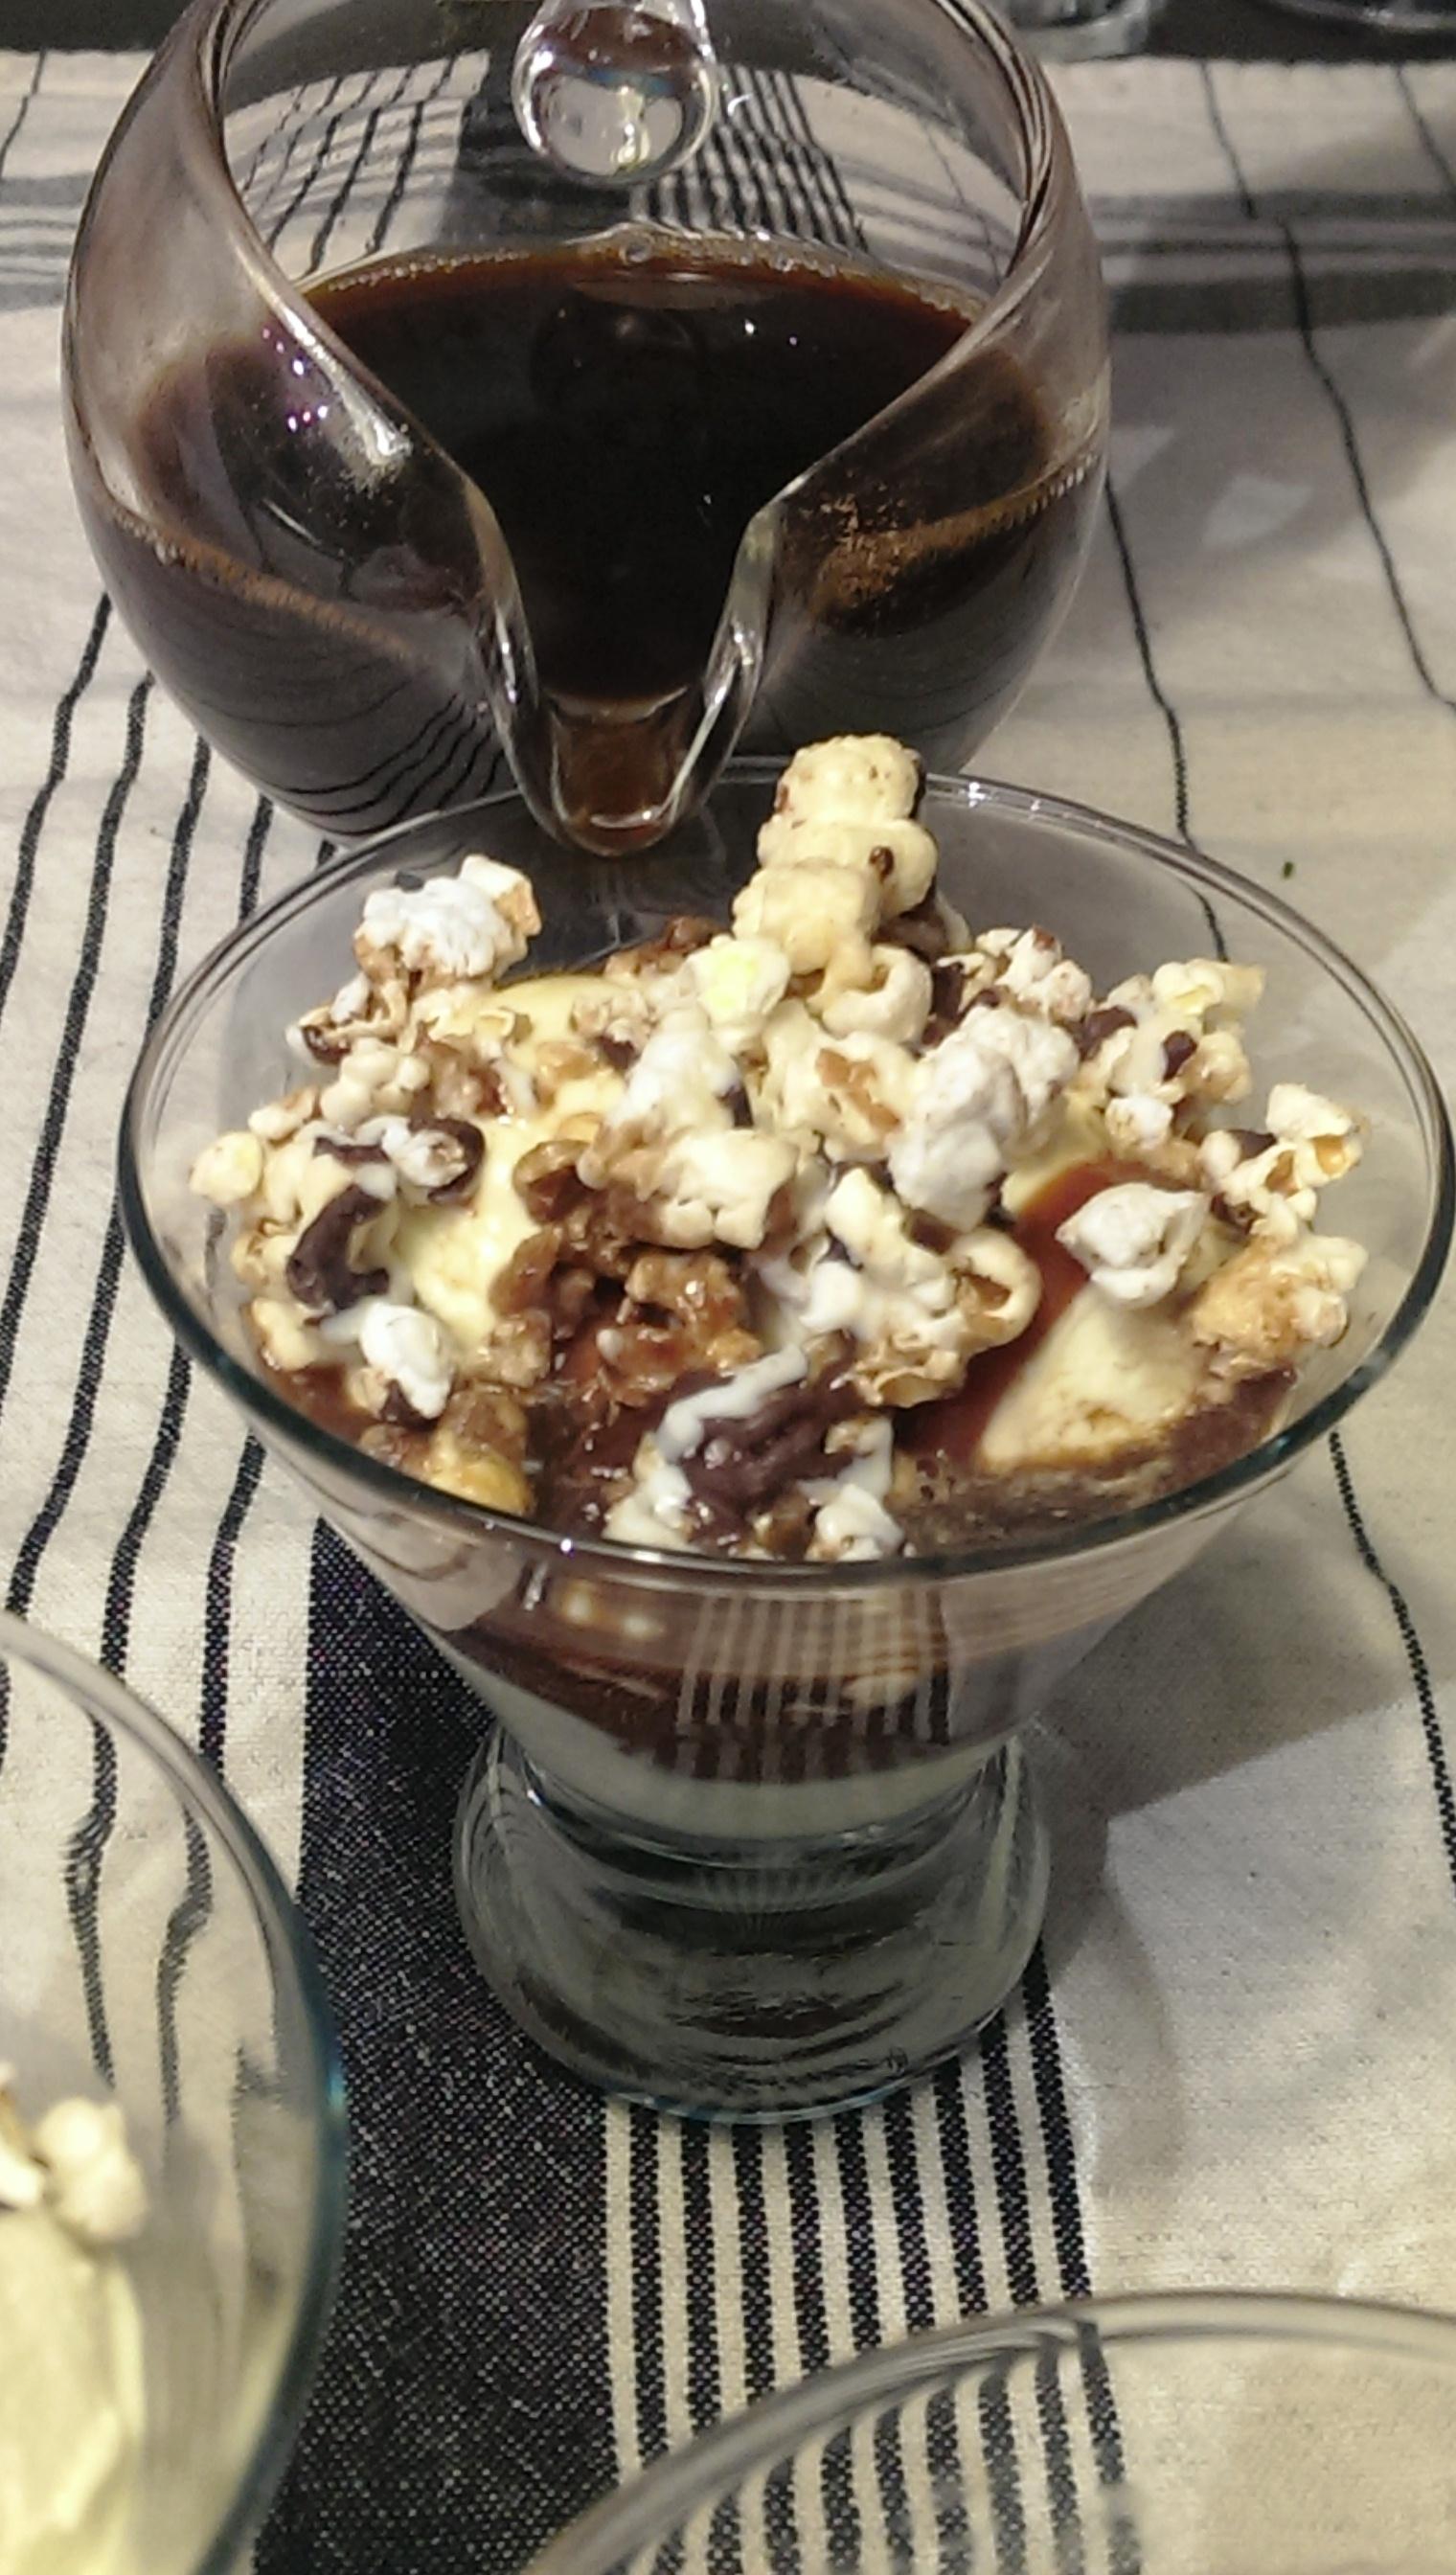 My Cousin Vinny (Caramel Popcorn Affogato)